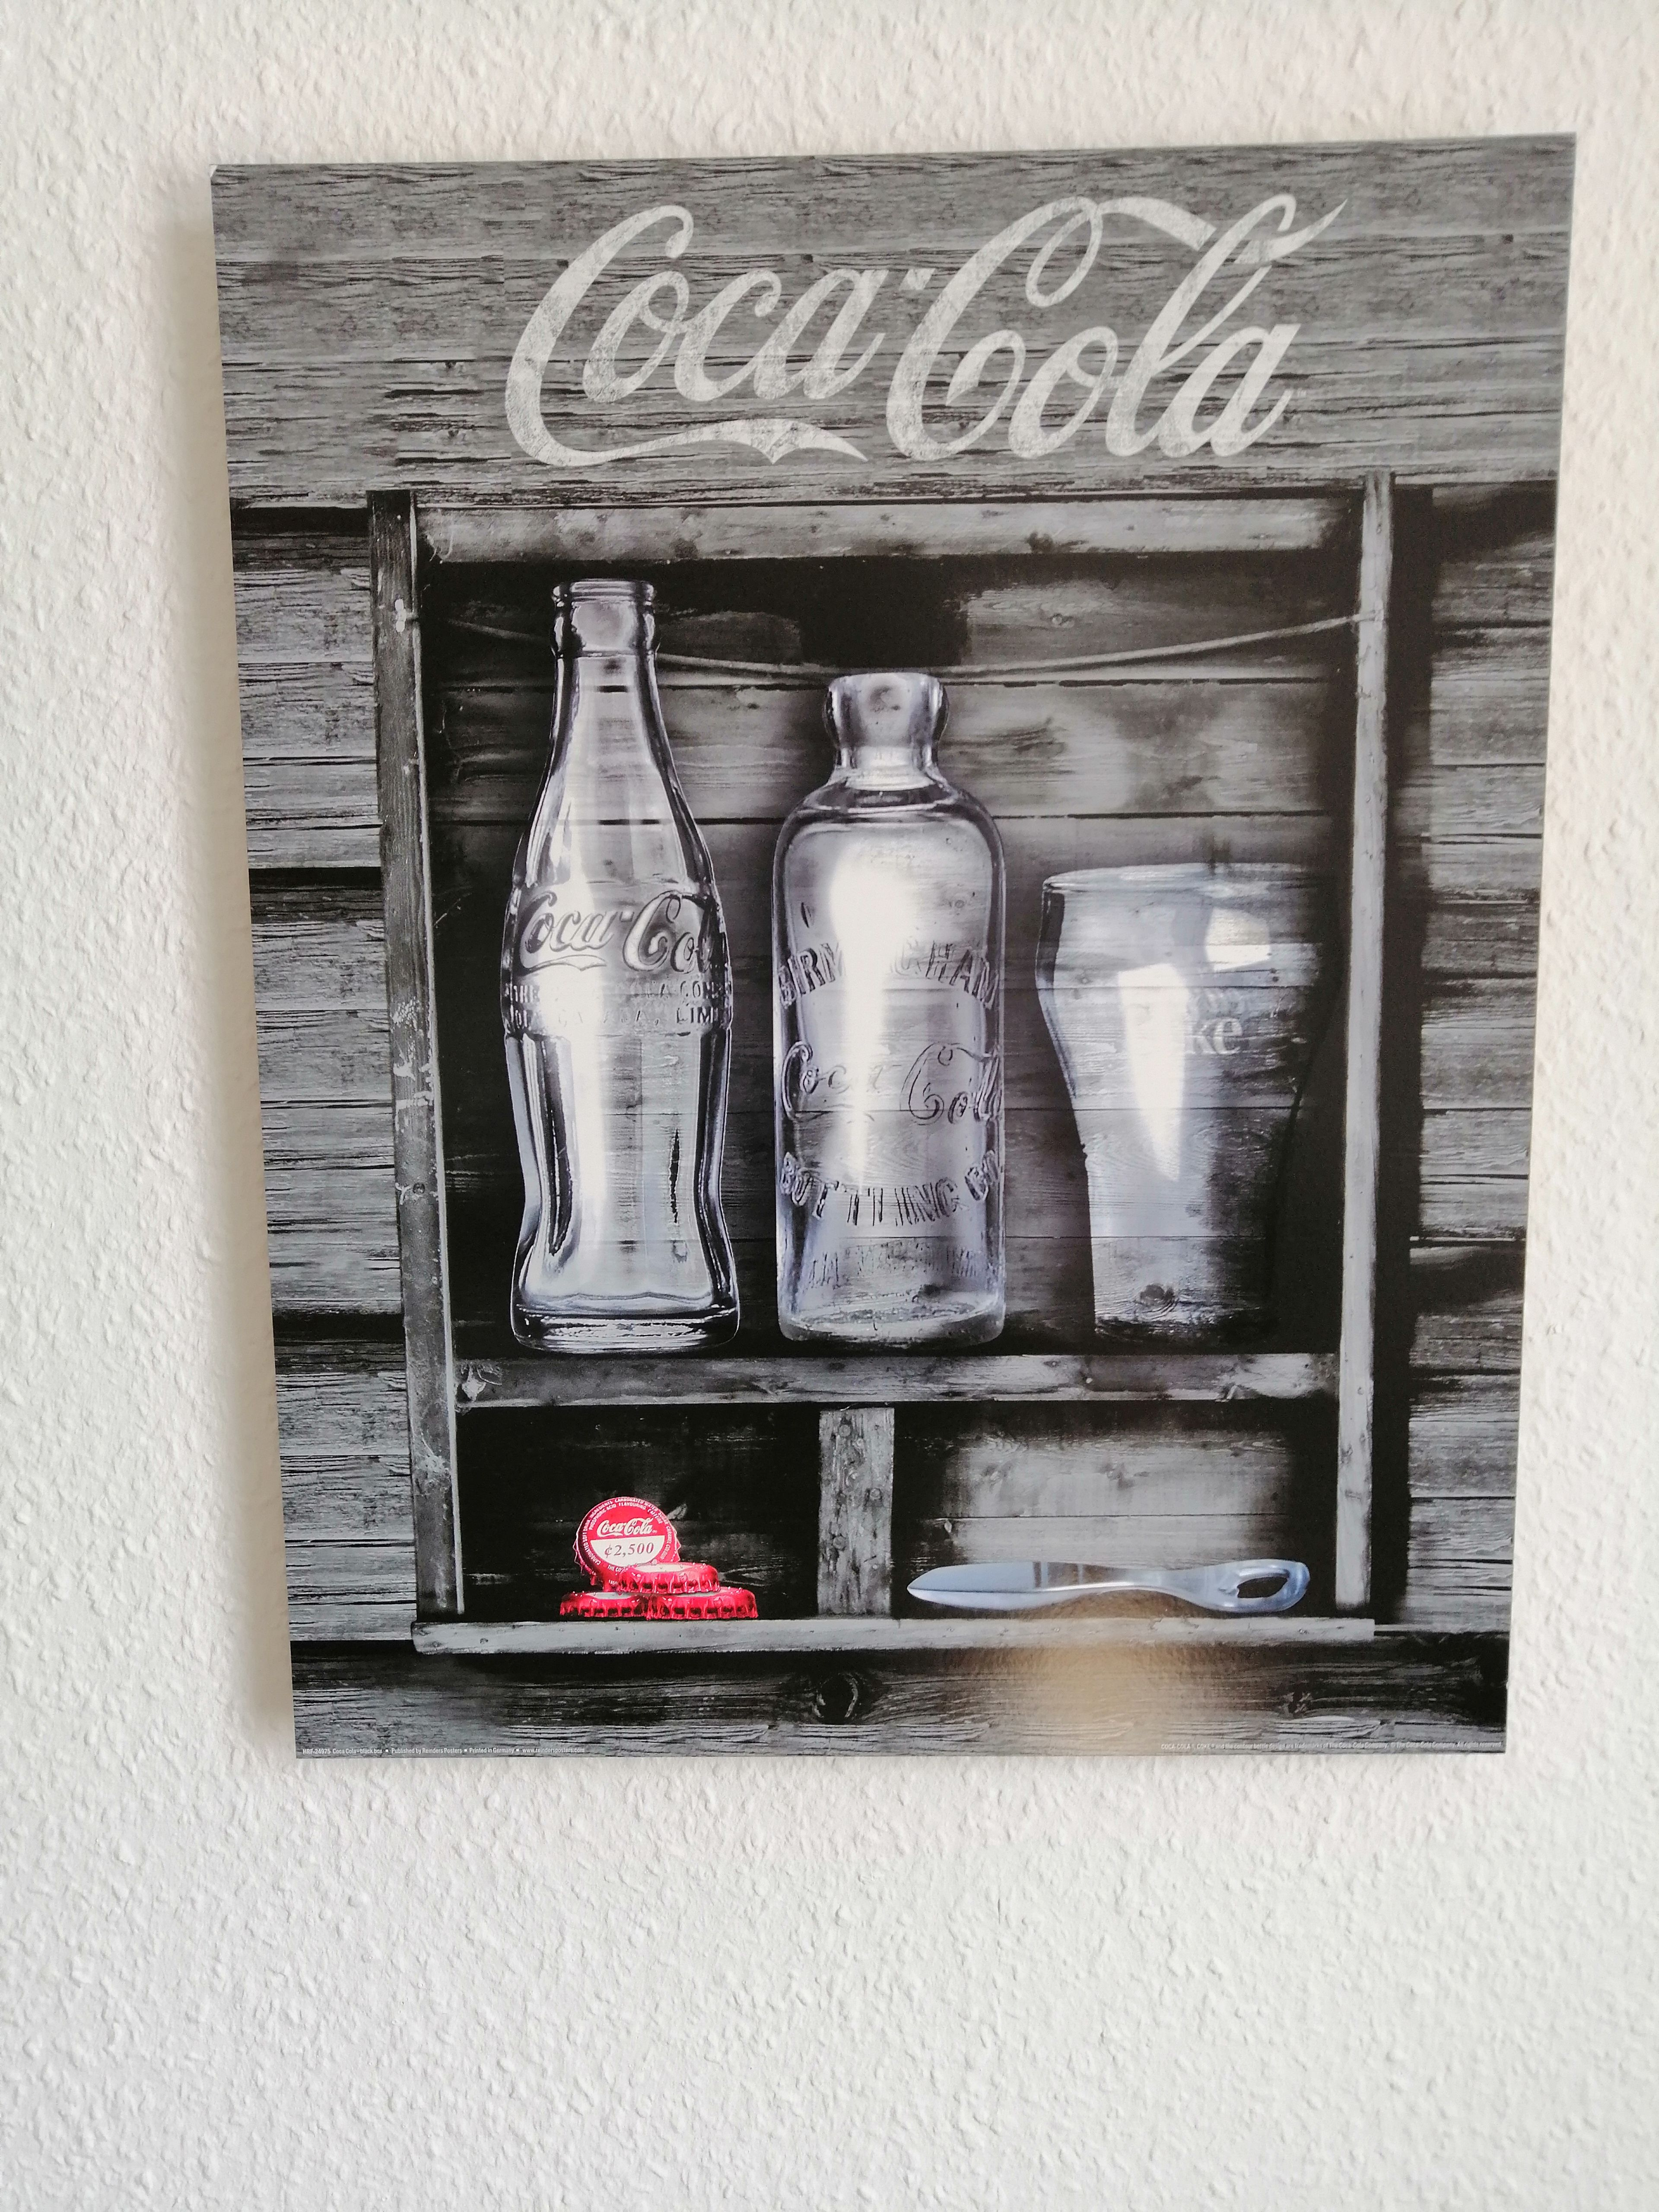 Coca Cola lässt grüßen :)  #werbung #productplacement